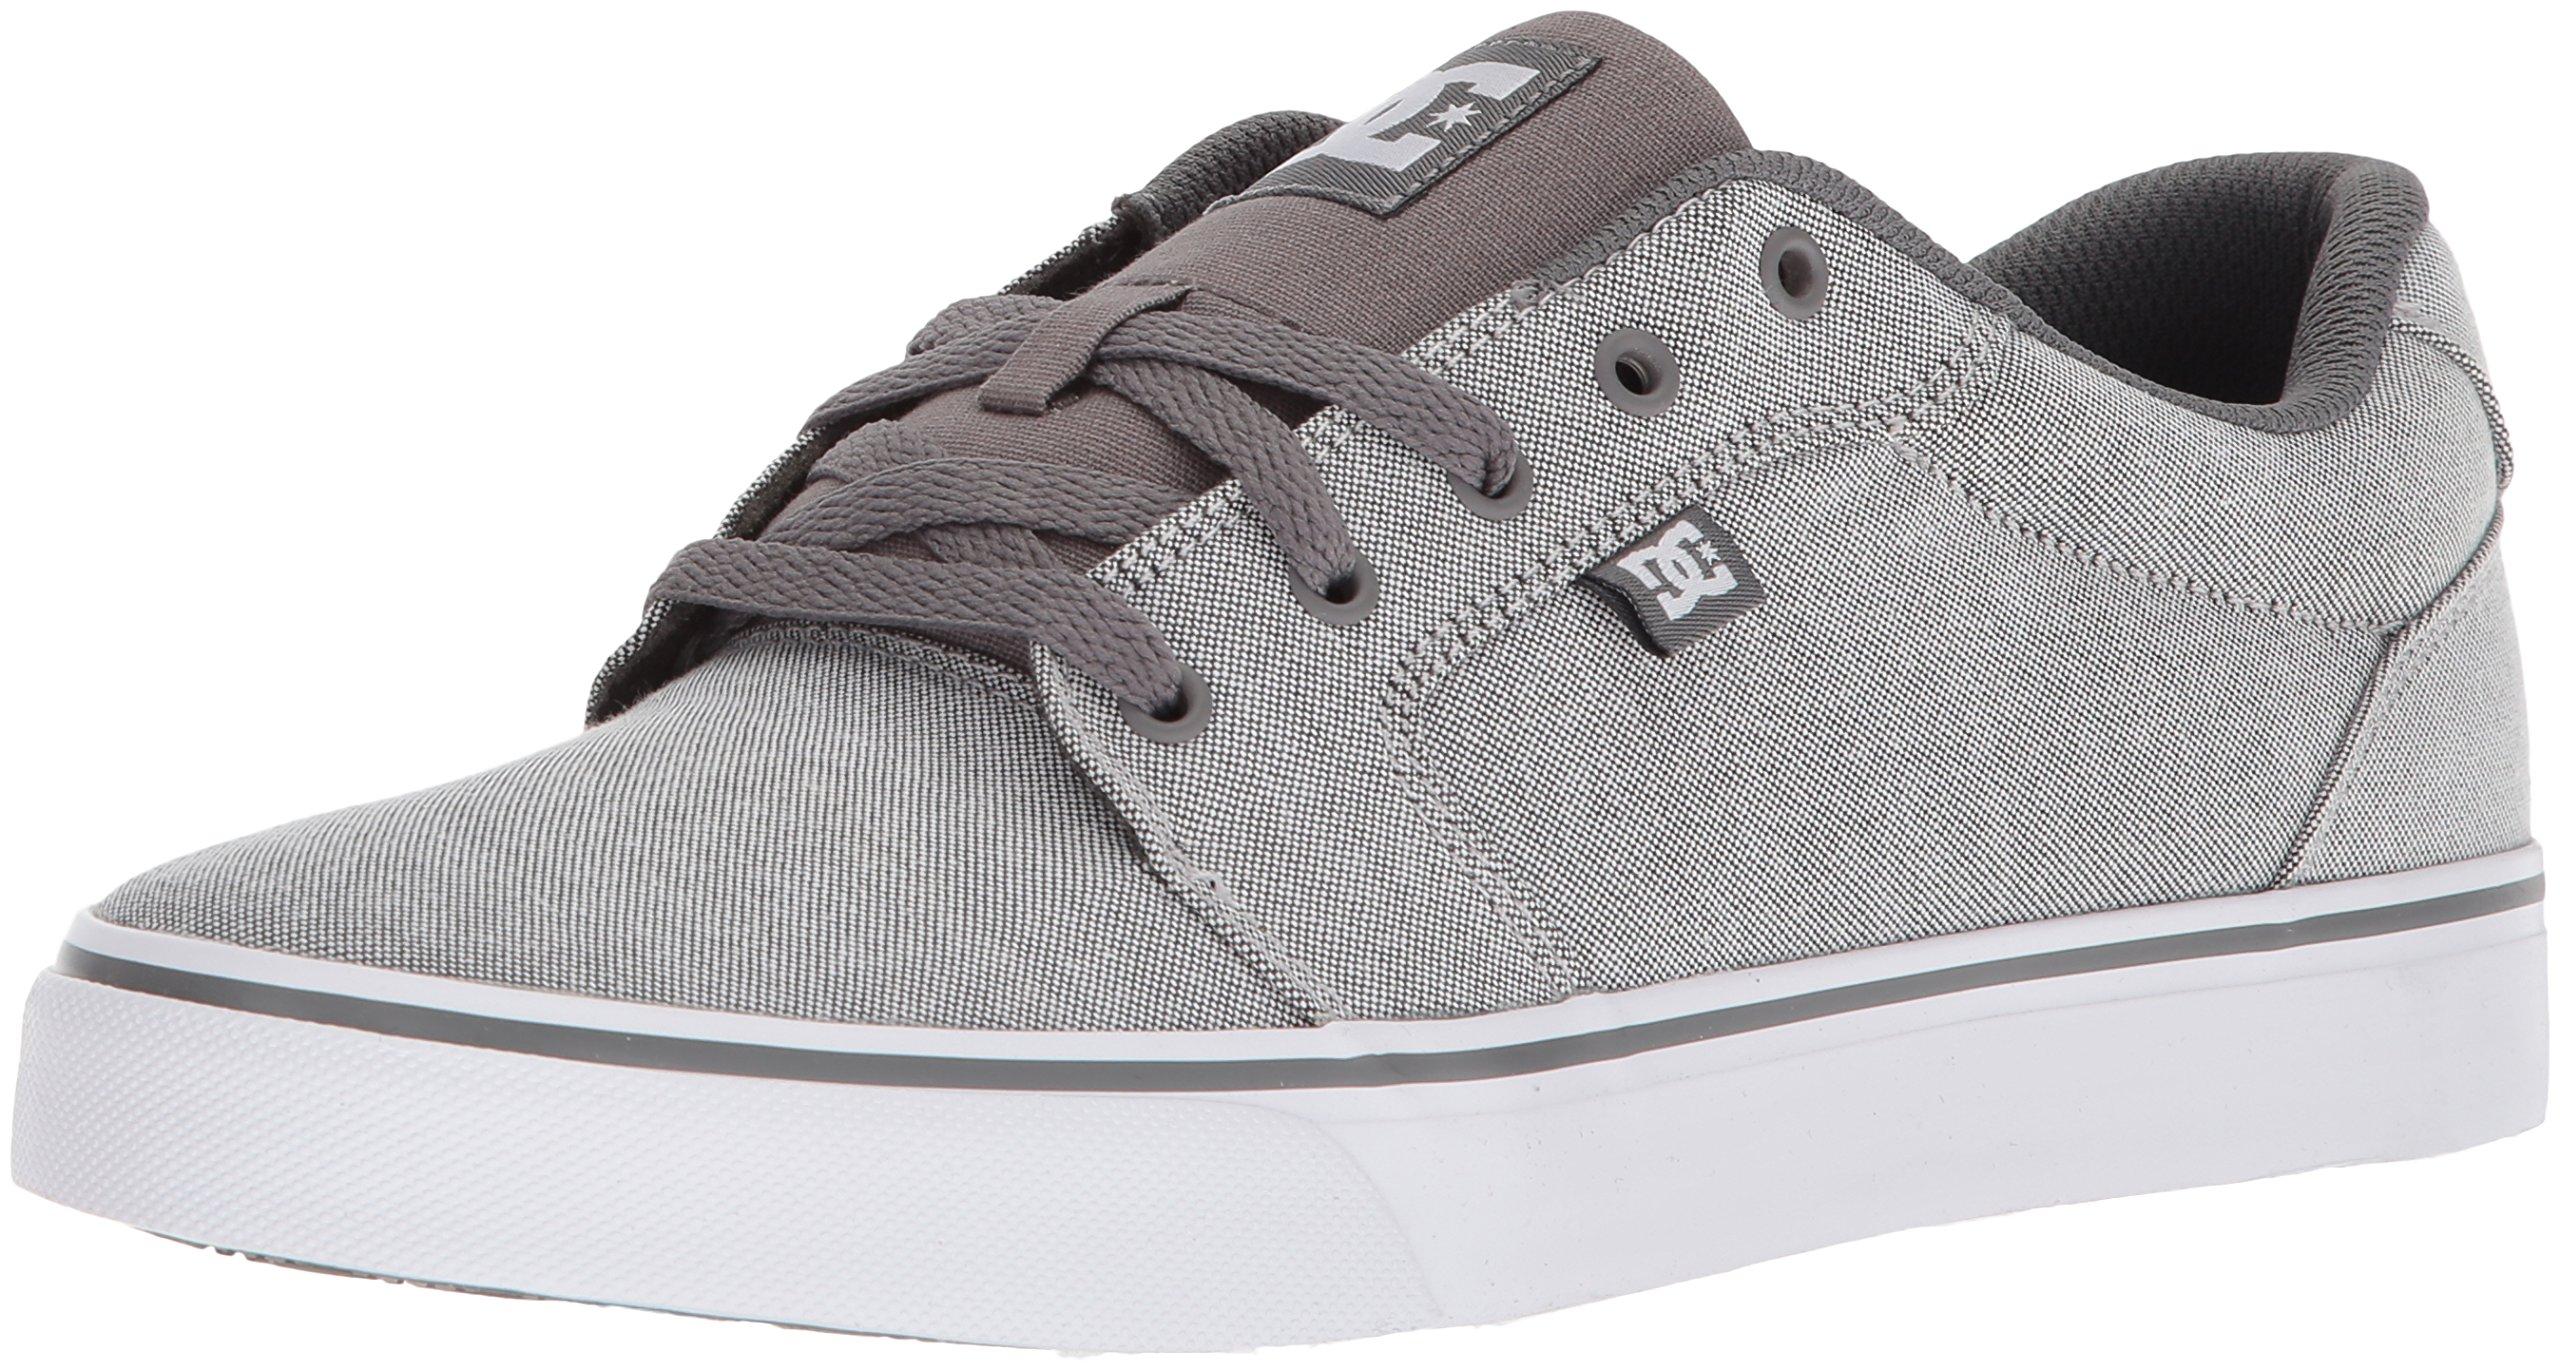 DC Men's Anvil Tx Skate Shoe, Grey Rinse, 11 D US